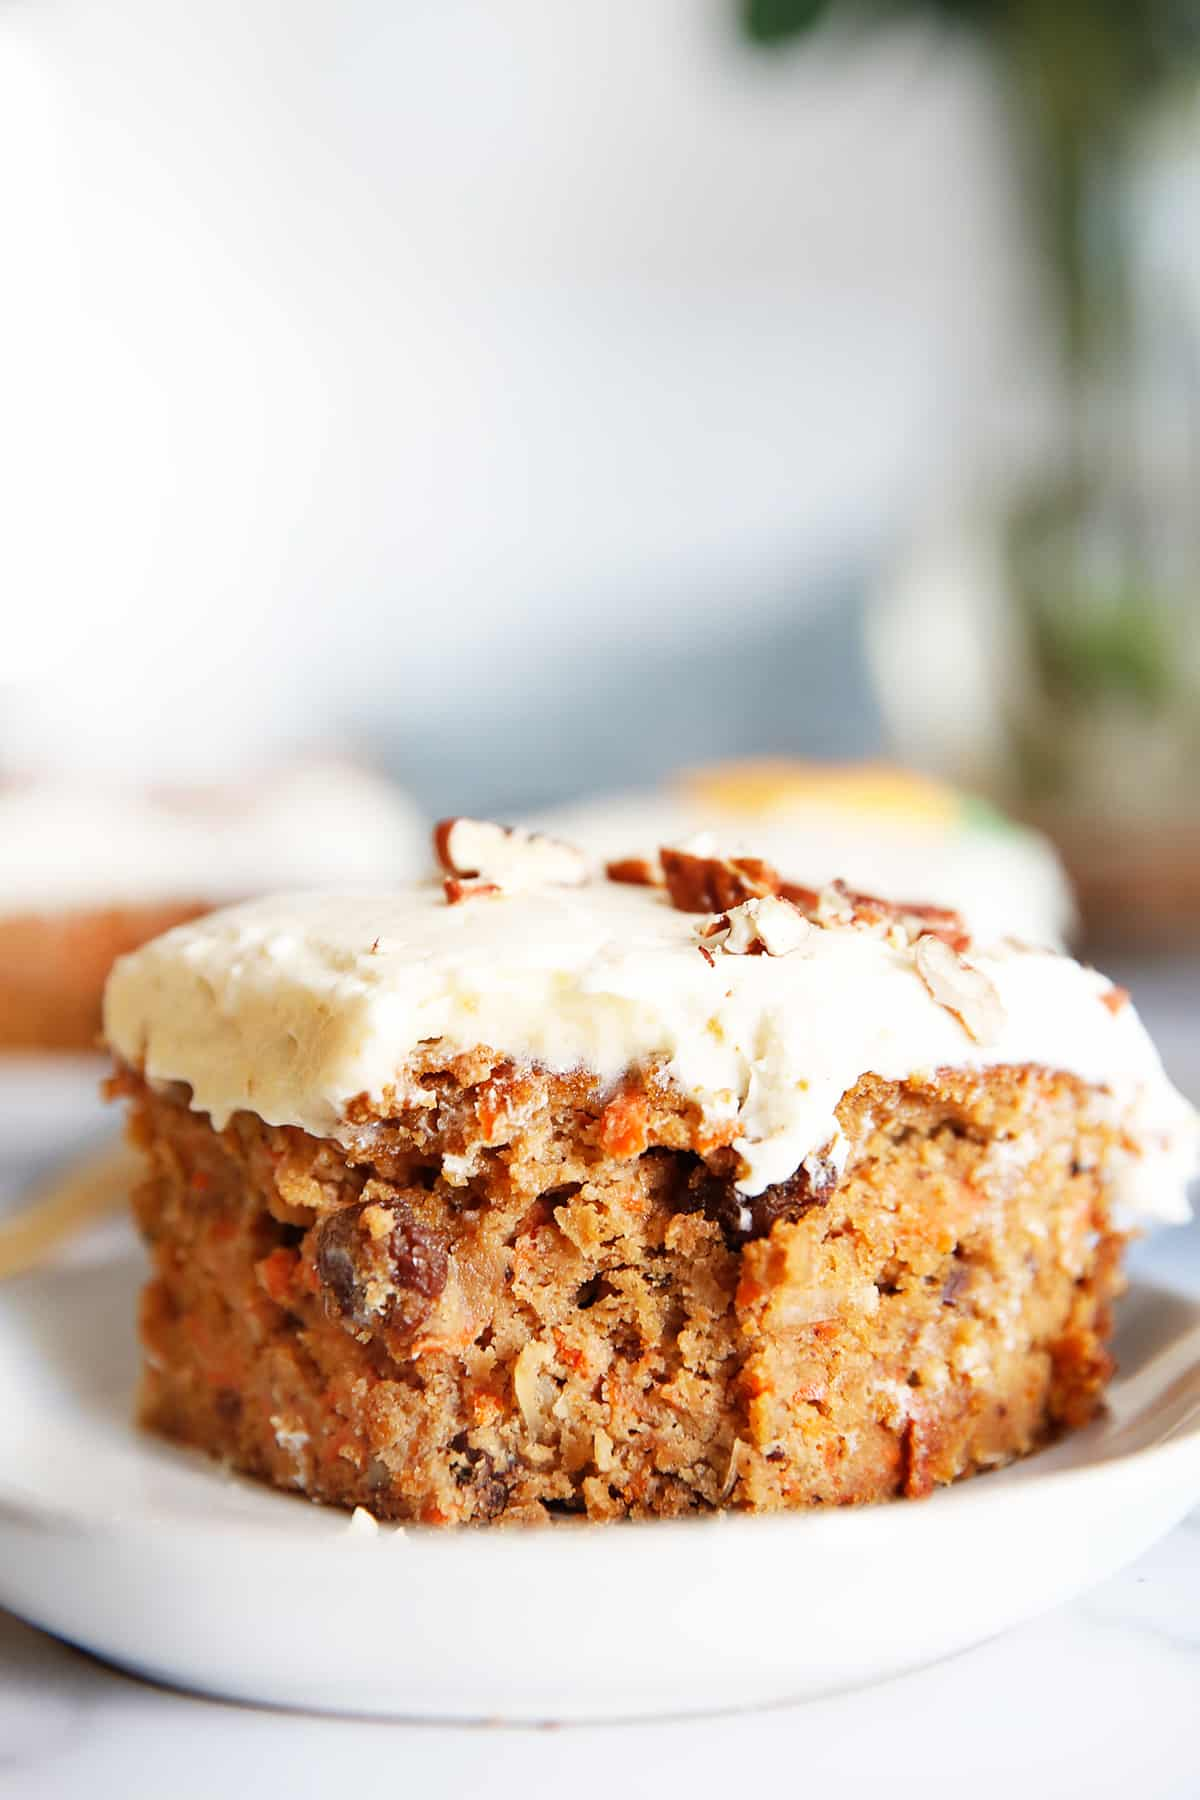 Lexi S Clean Kitchen Gluten Free Carrot Cake Easy Sheet Cake